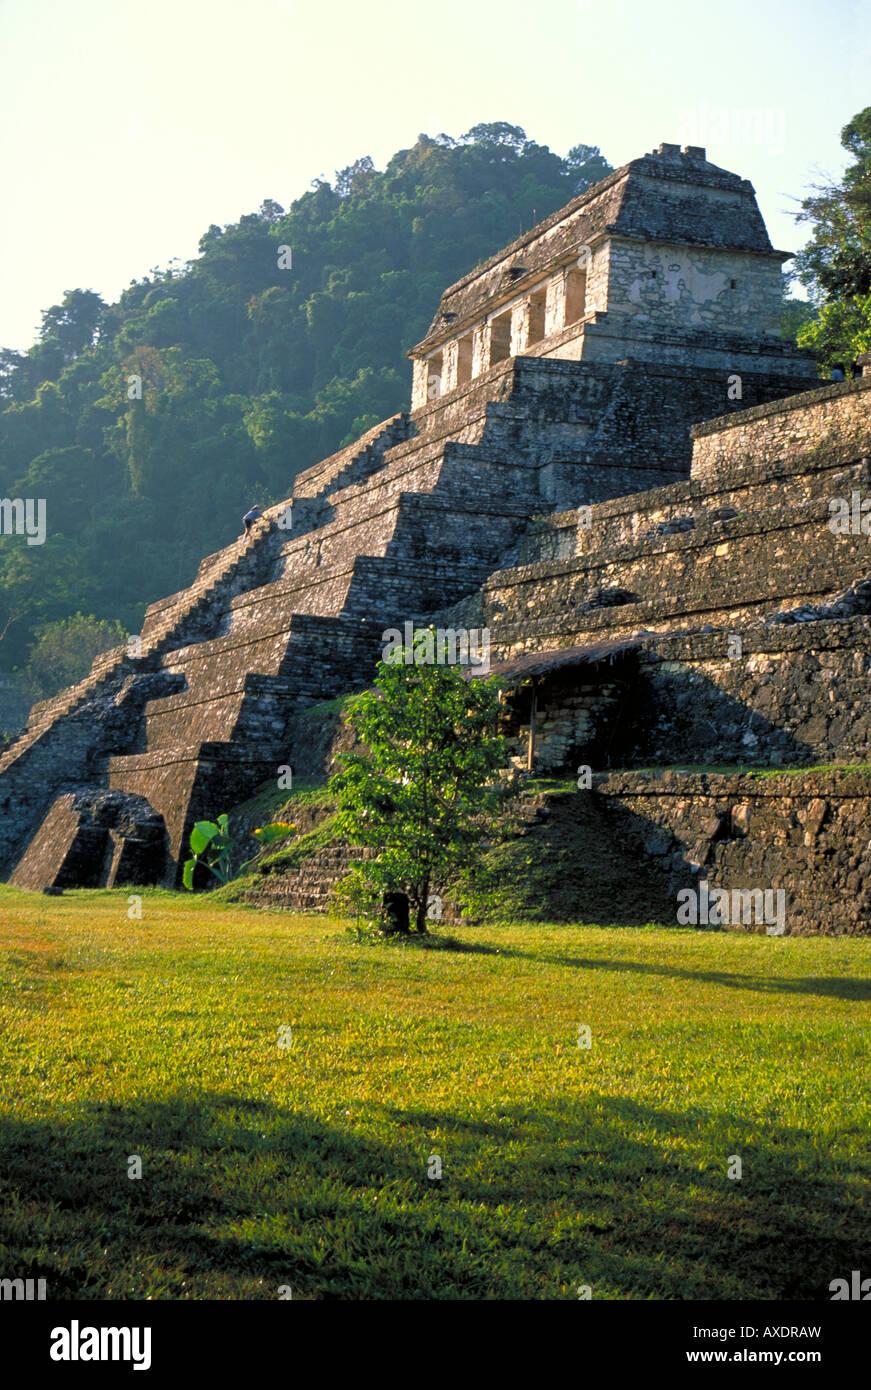 Elk156 2348 Mexico Yucatan Palenque Chiapas Mayan site 600-900 Temple of the Inscriptions - Stock Image